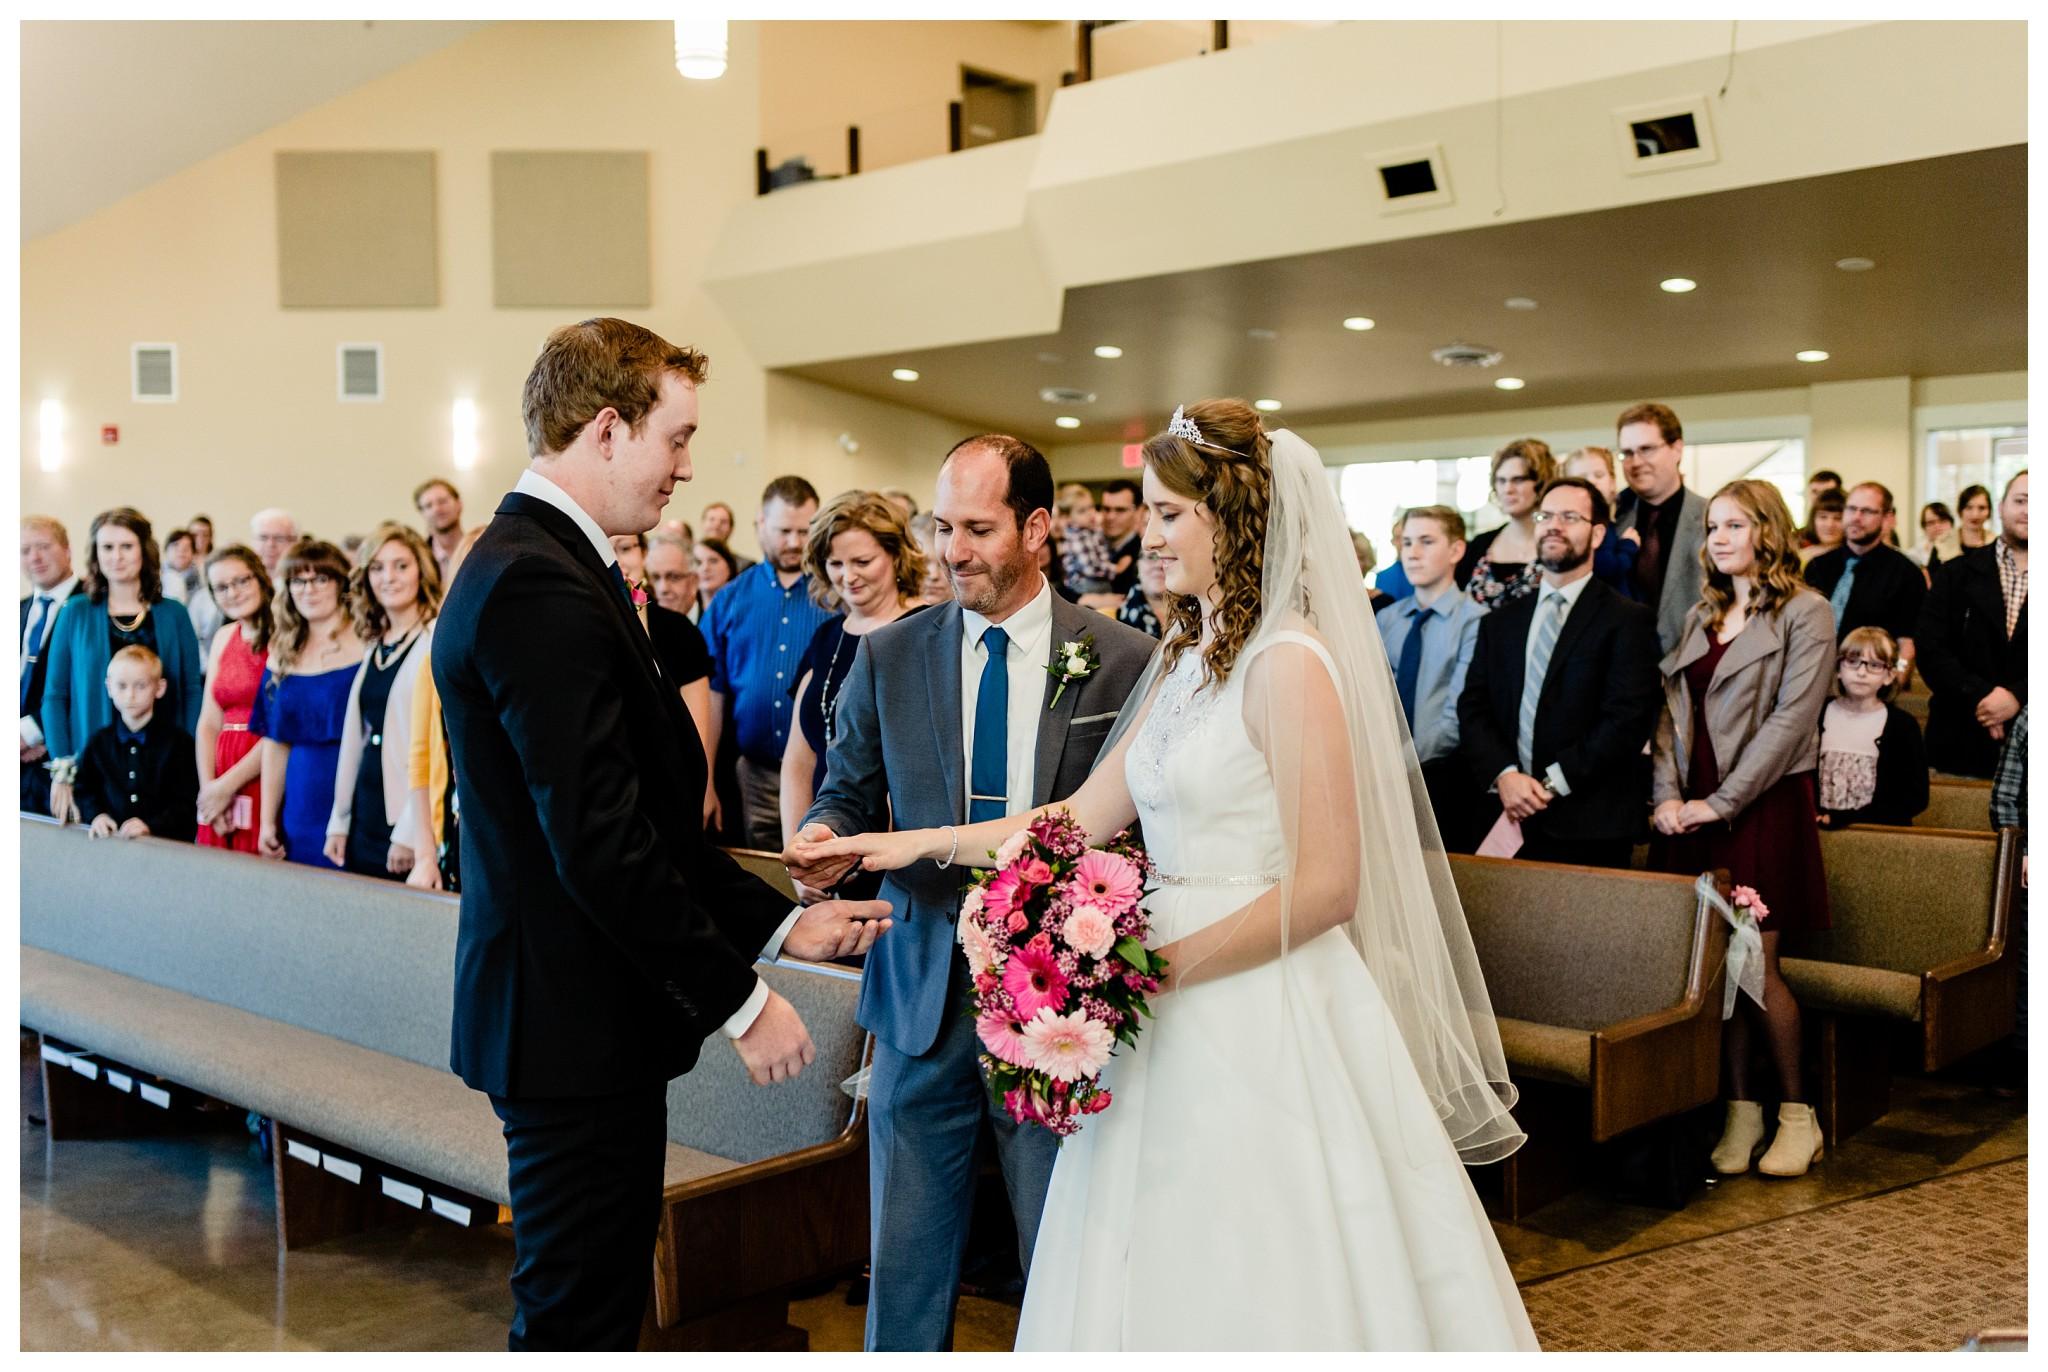 Aldergrove Park Christian Church Wedding Photography Pink Flowers Blue Bridesmaid Dress Fall_0060.jpg